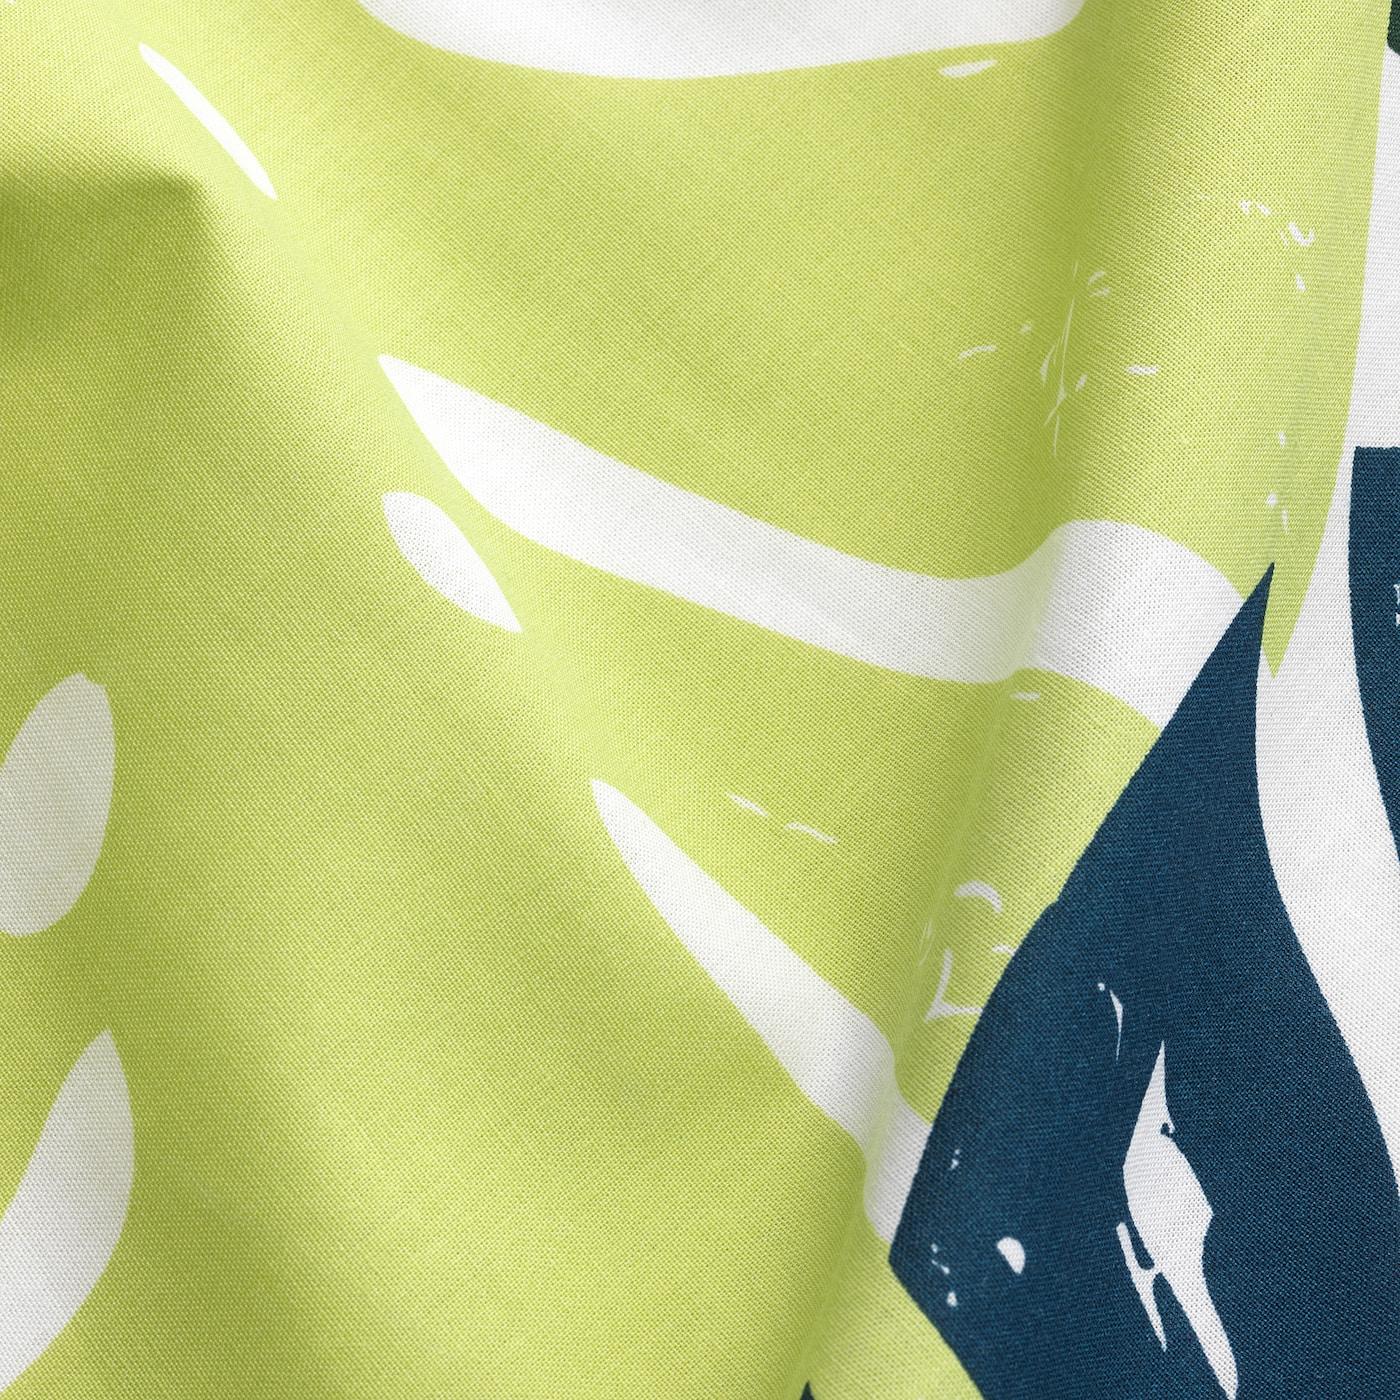 URSKOG curtains with tie-backs, 1 pair green 250 cm 120 cm